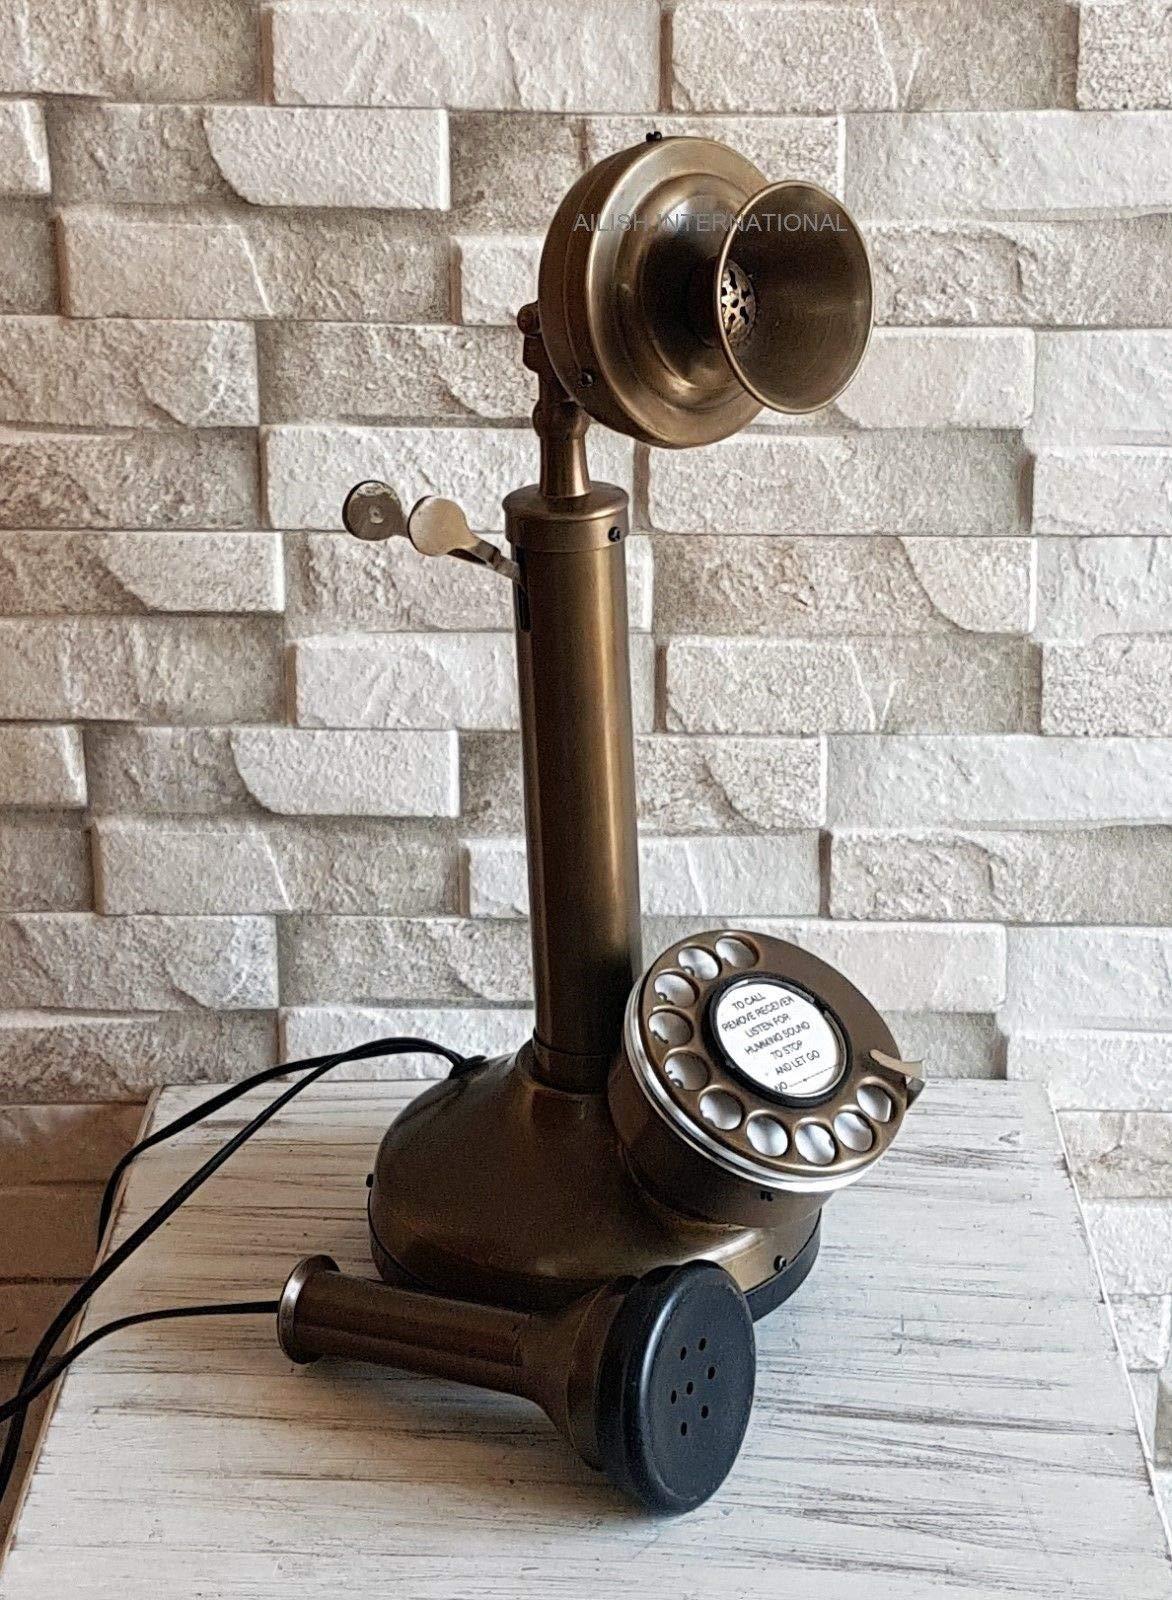 AILISH INTERNATIONAL Vintage Look Full Solid Brass Candlestick Telephone by AILISH INTERNATIONAL